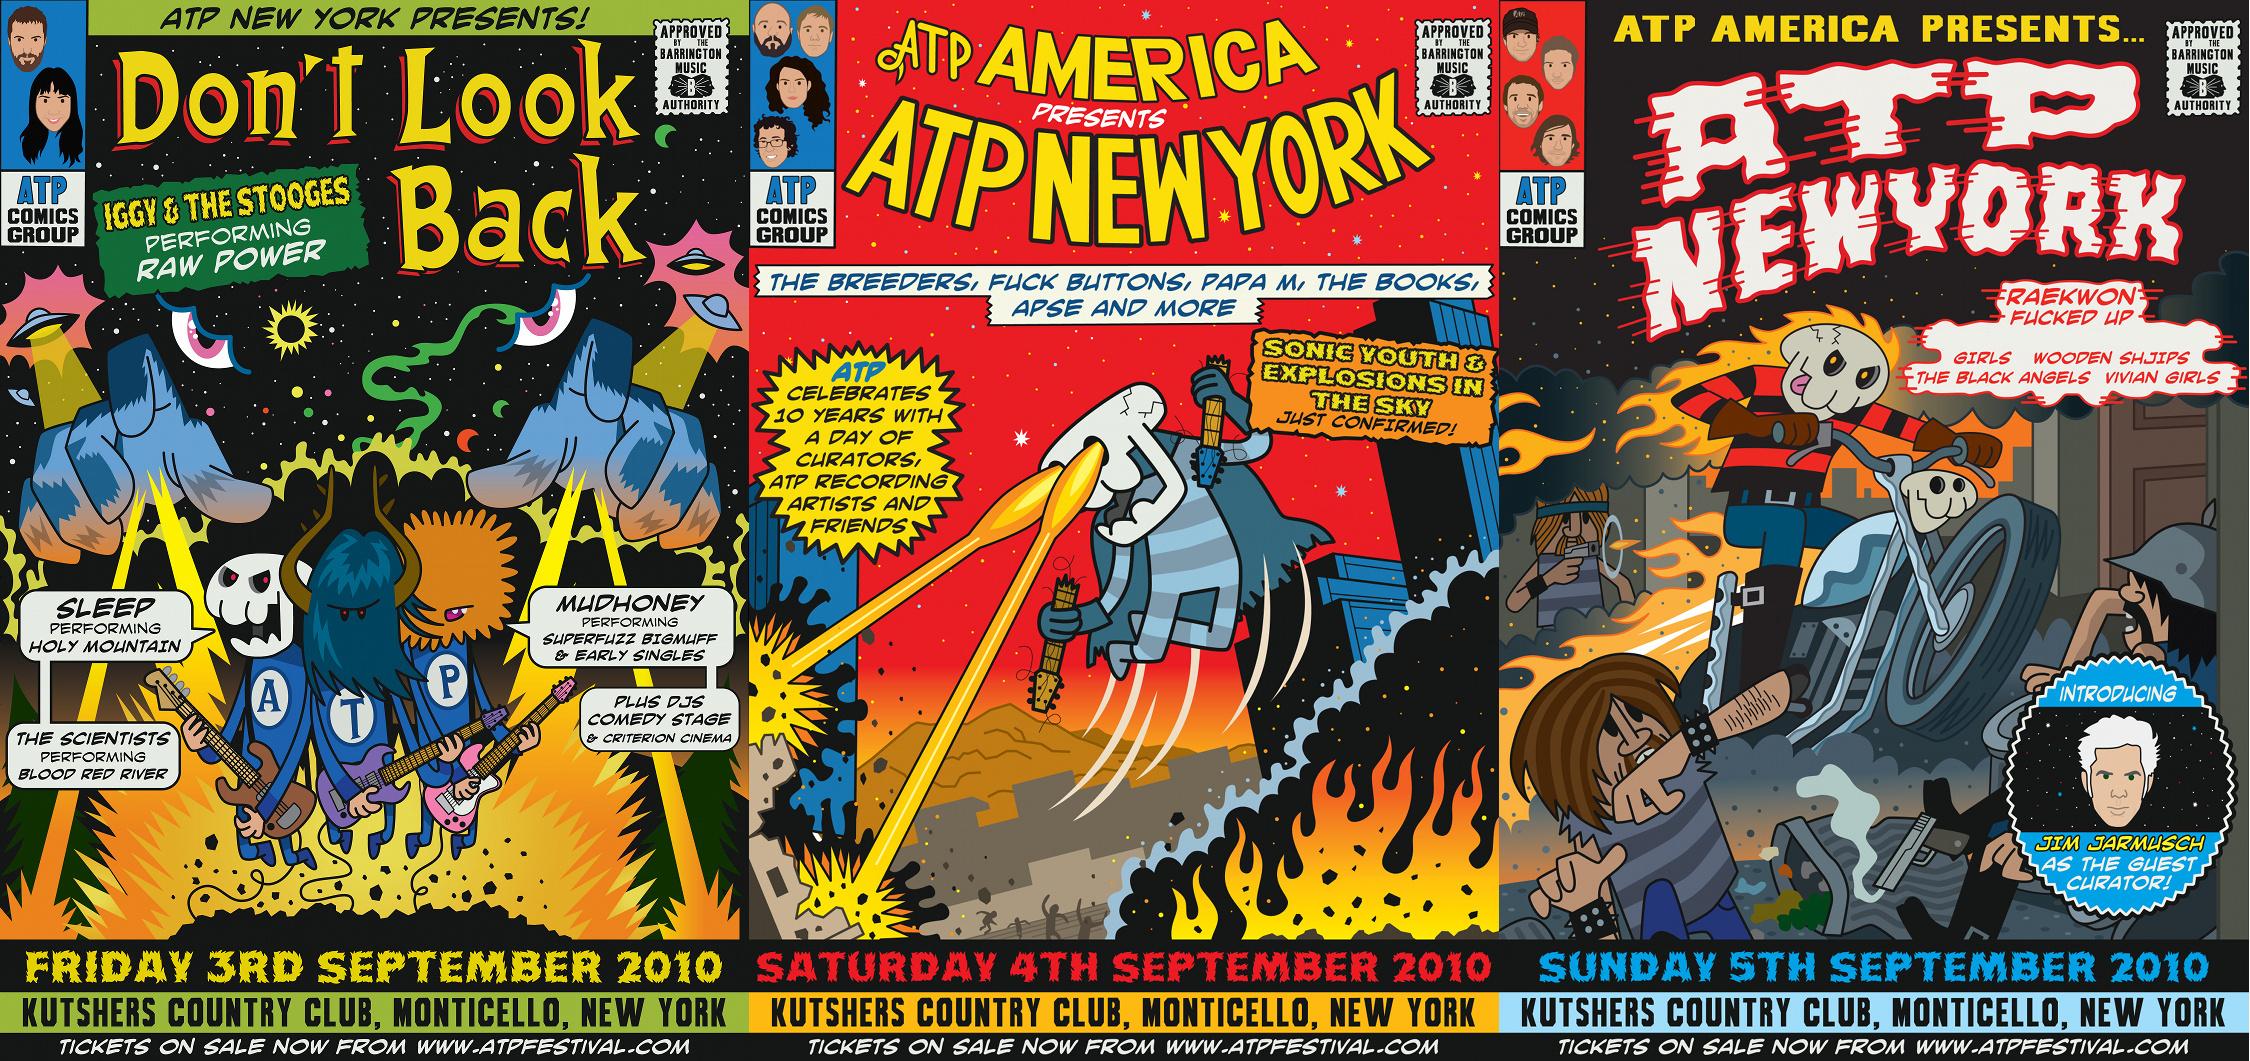 Atp New York